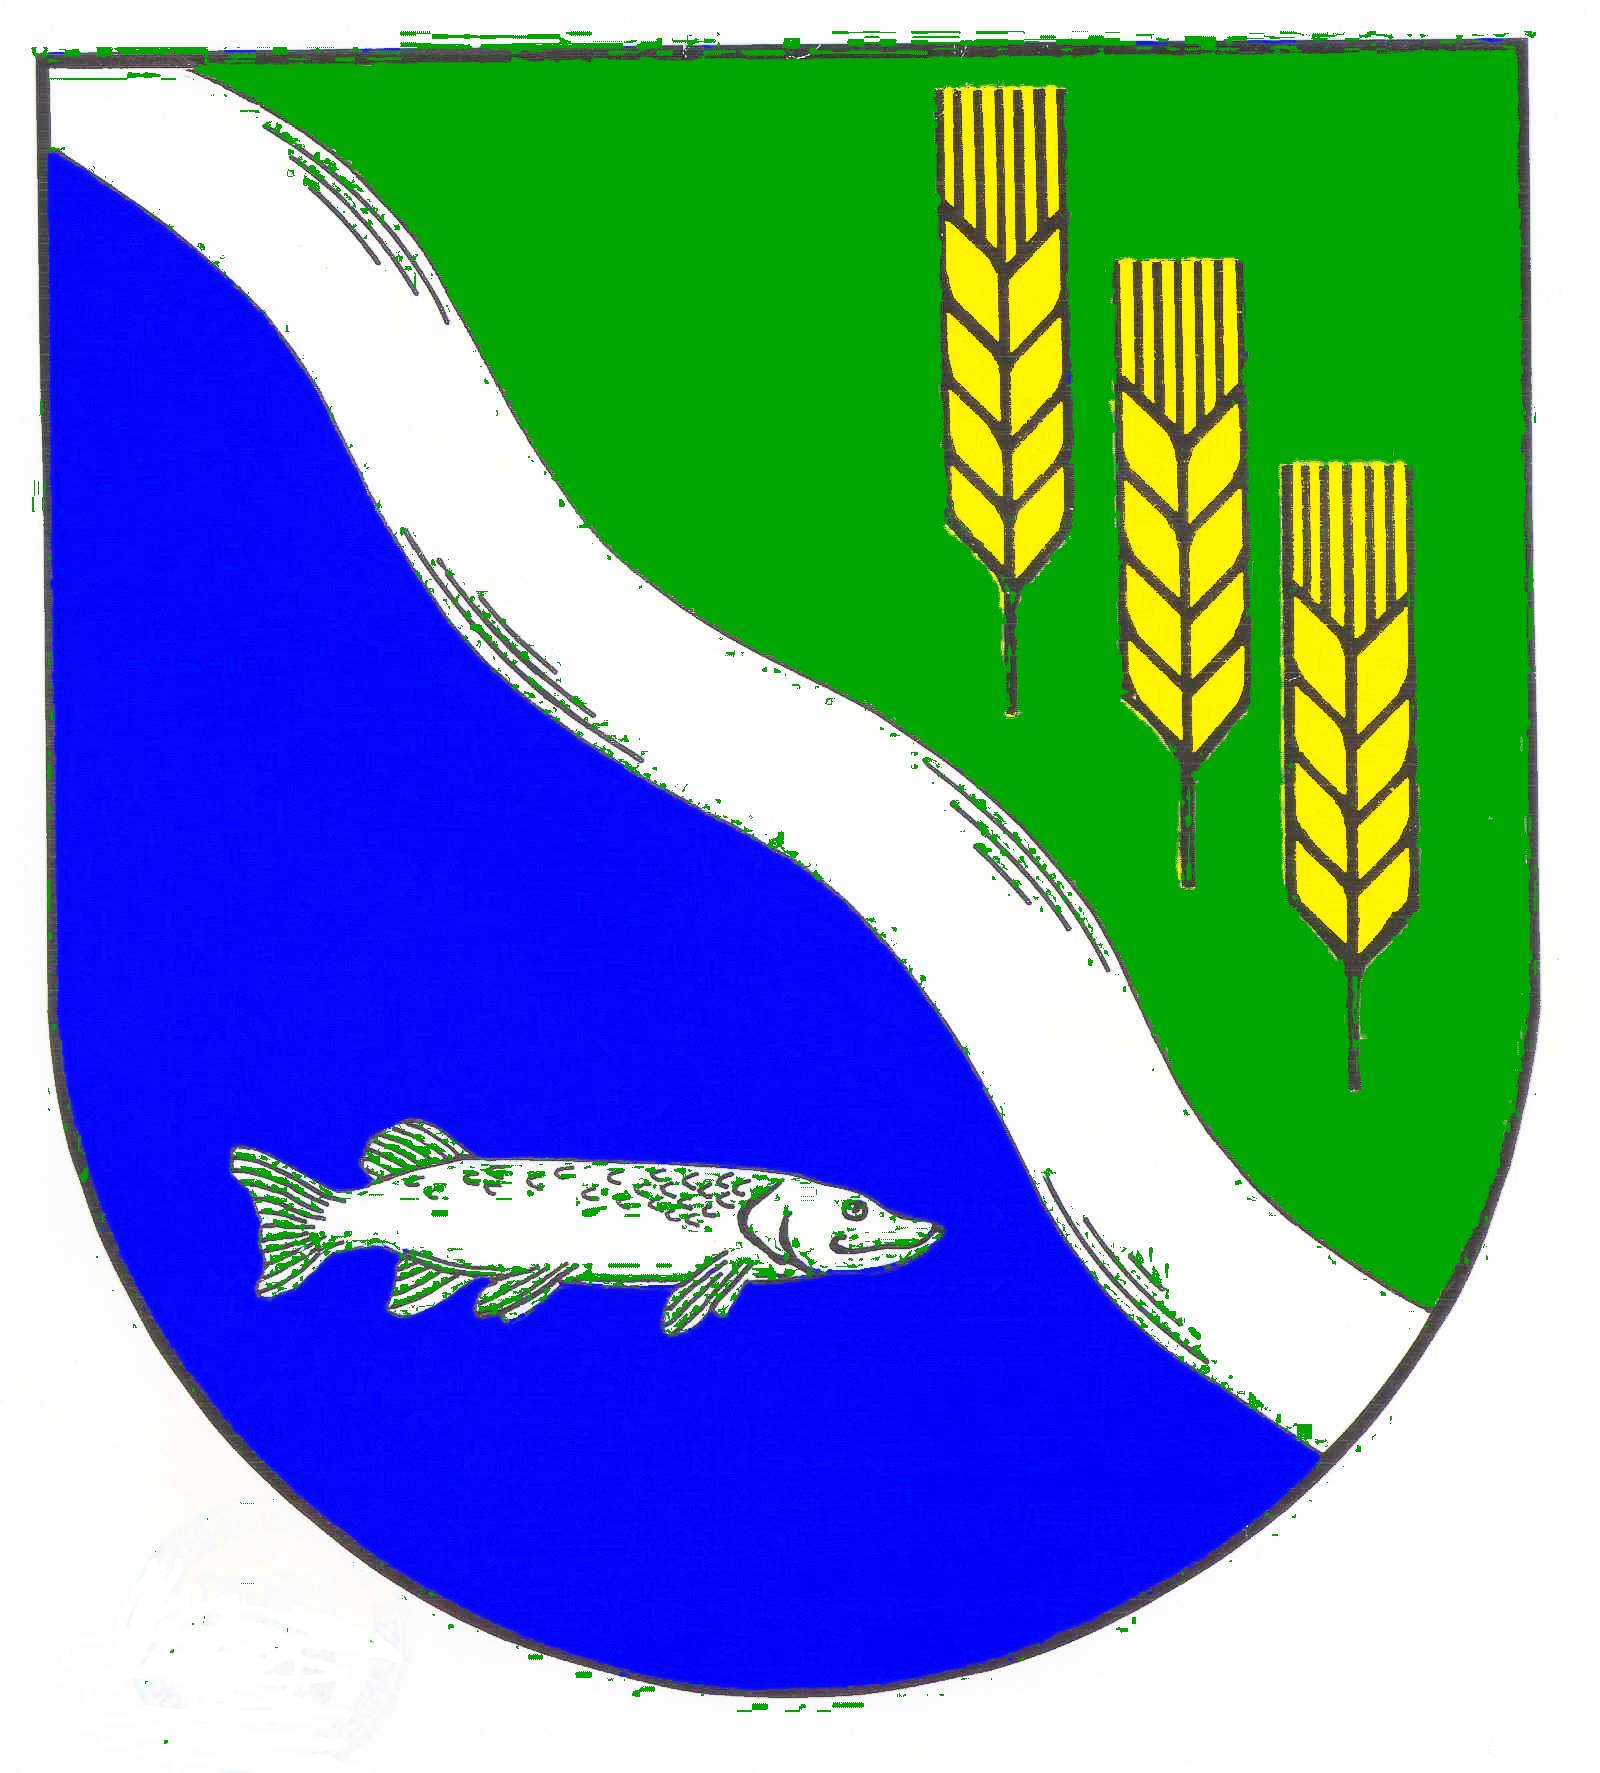 Wappen GemeindeSchierensee, Kreis Rendsburg-Eckernförde